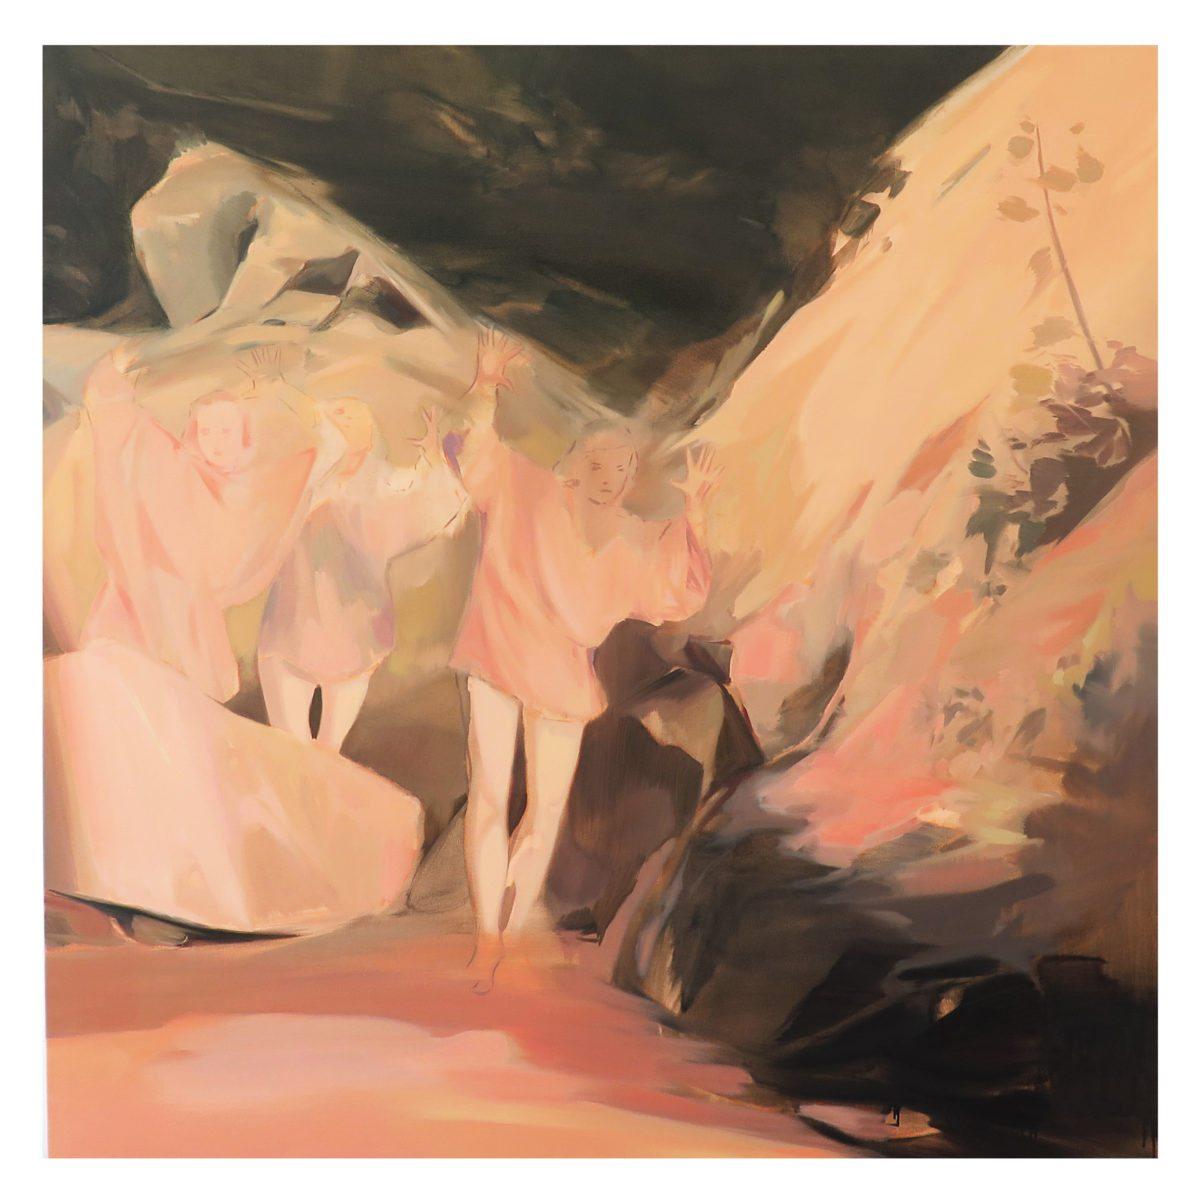 Corri-Lynn Tetz, Jazz Hands, 2017 with Lisa Kehler Art + Projects